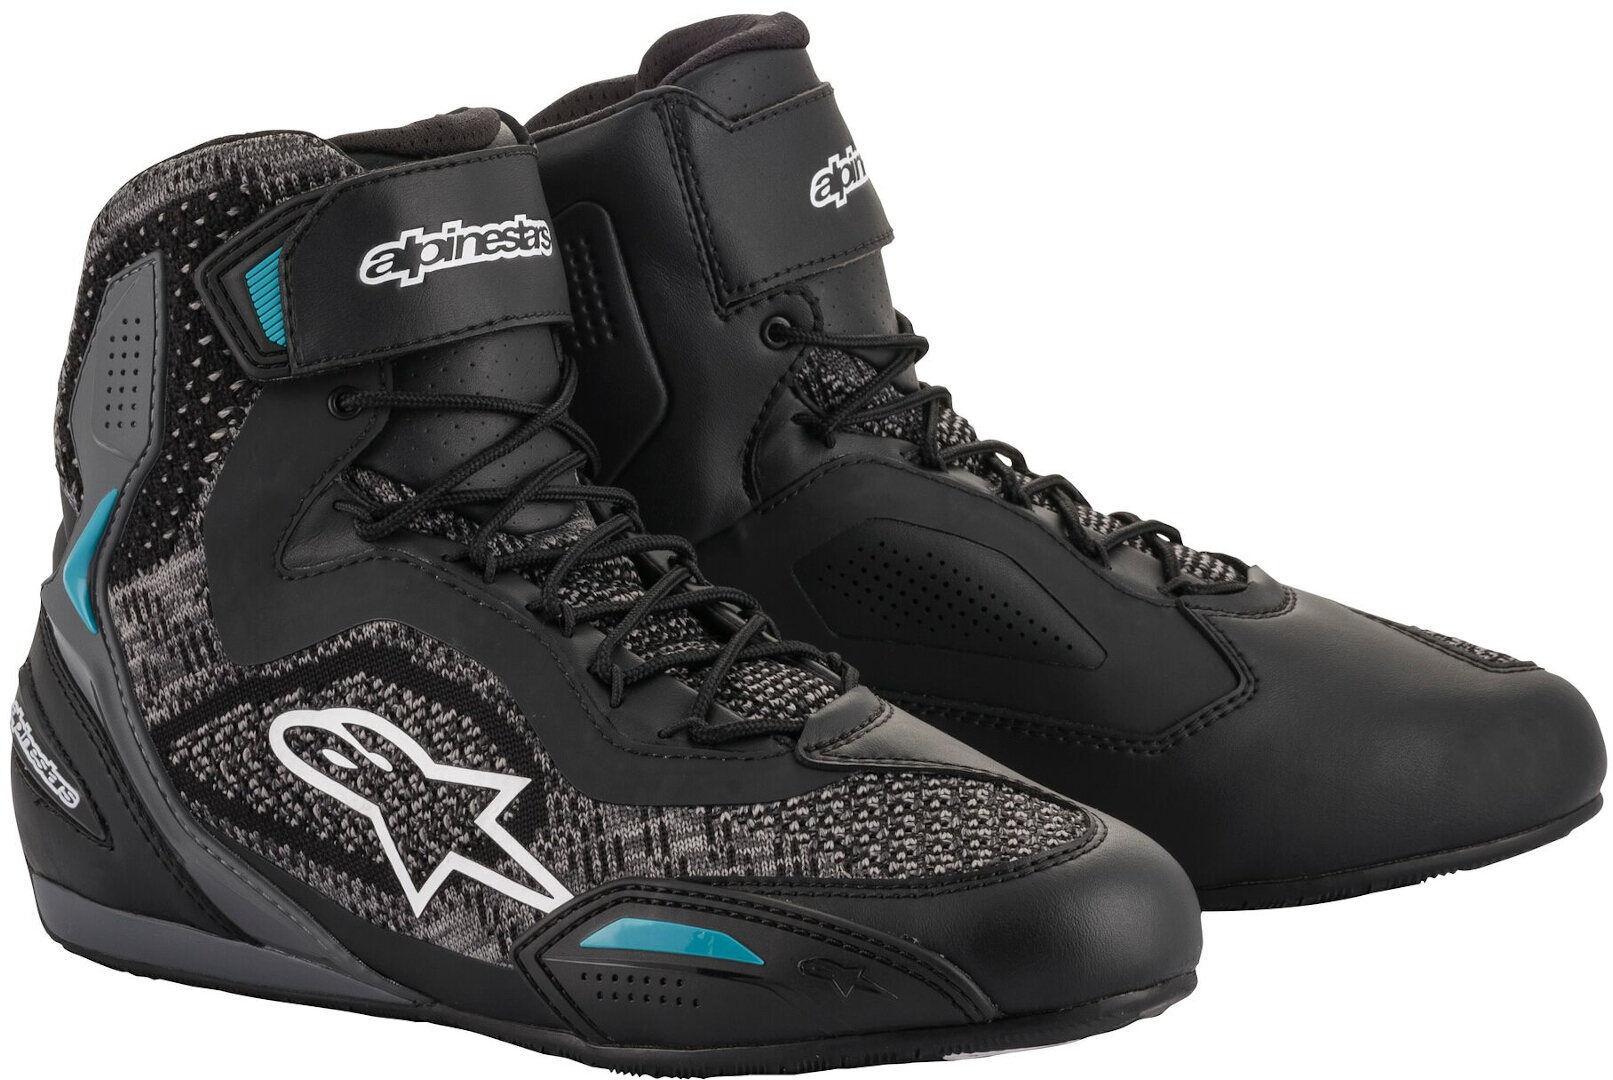 Alpinestars Stella Faster-3 Rideknit Ladies Motorcycle Shoes Black White Blue 43